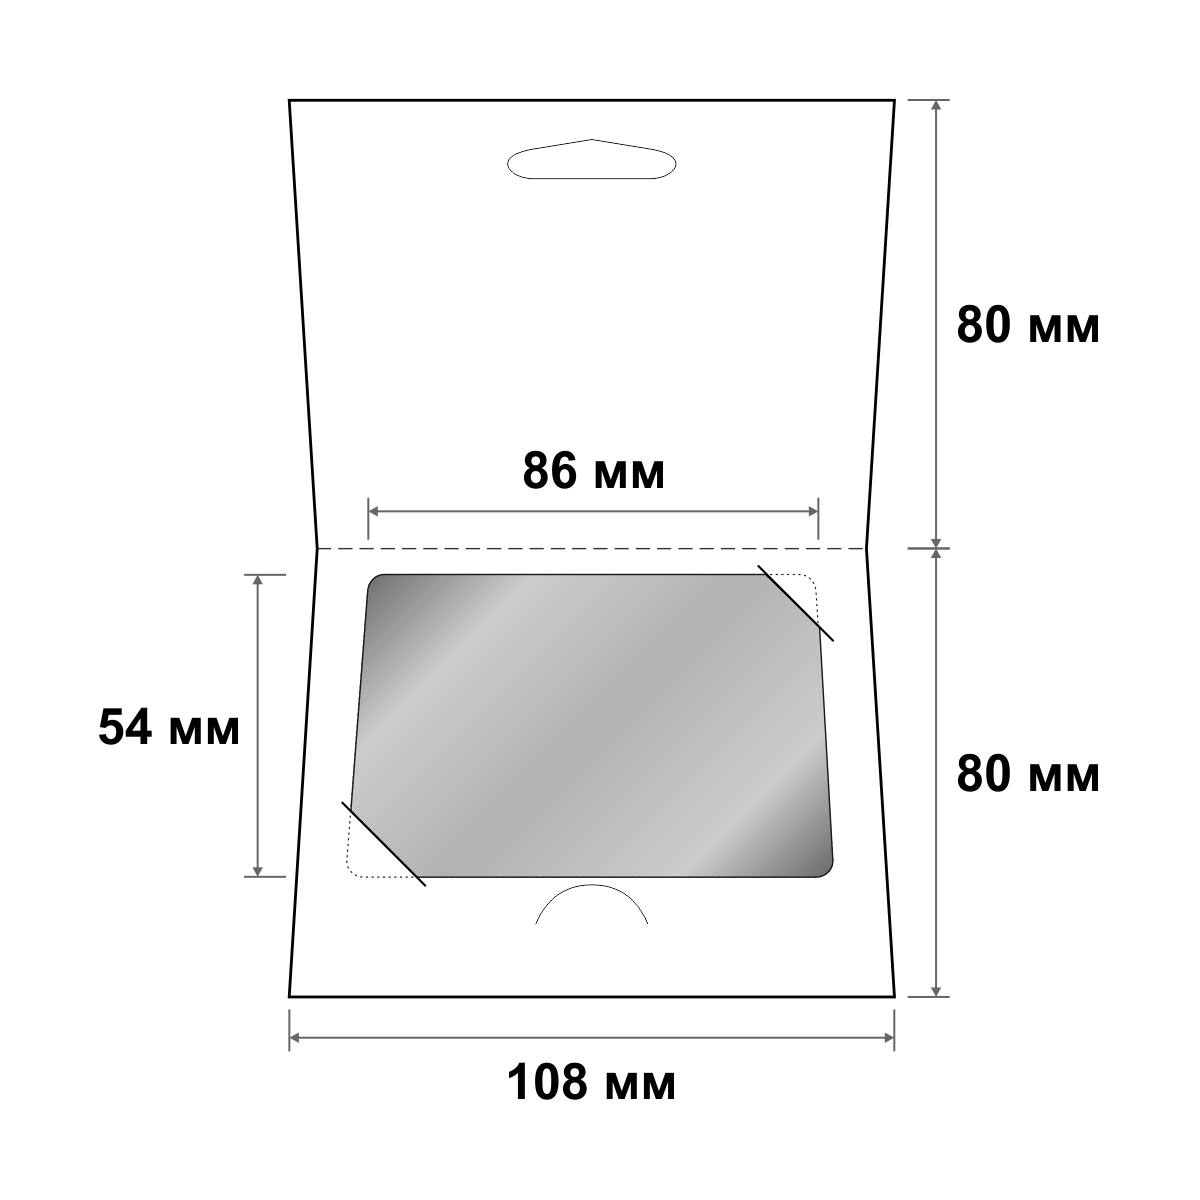 Кардхолдер-конверт для подарочного сертификата 108х80 мм